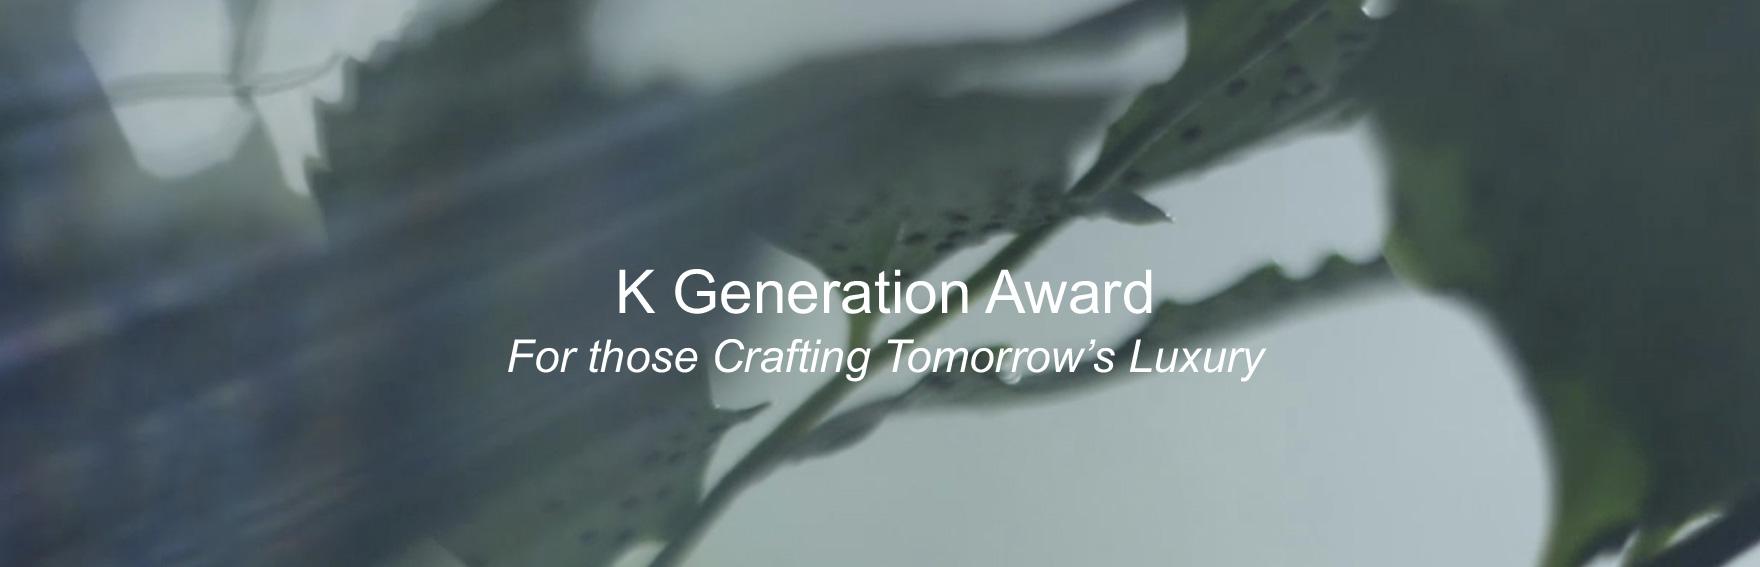 K Generation Award